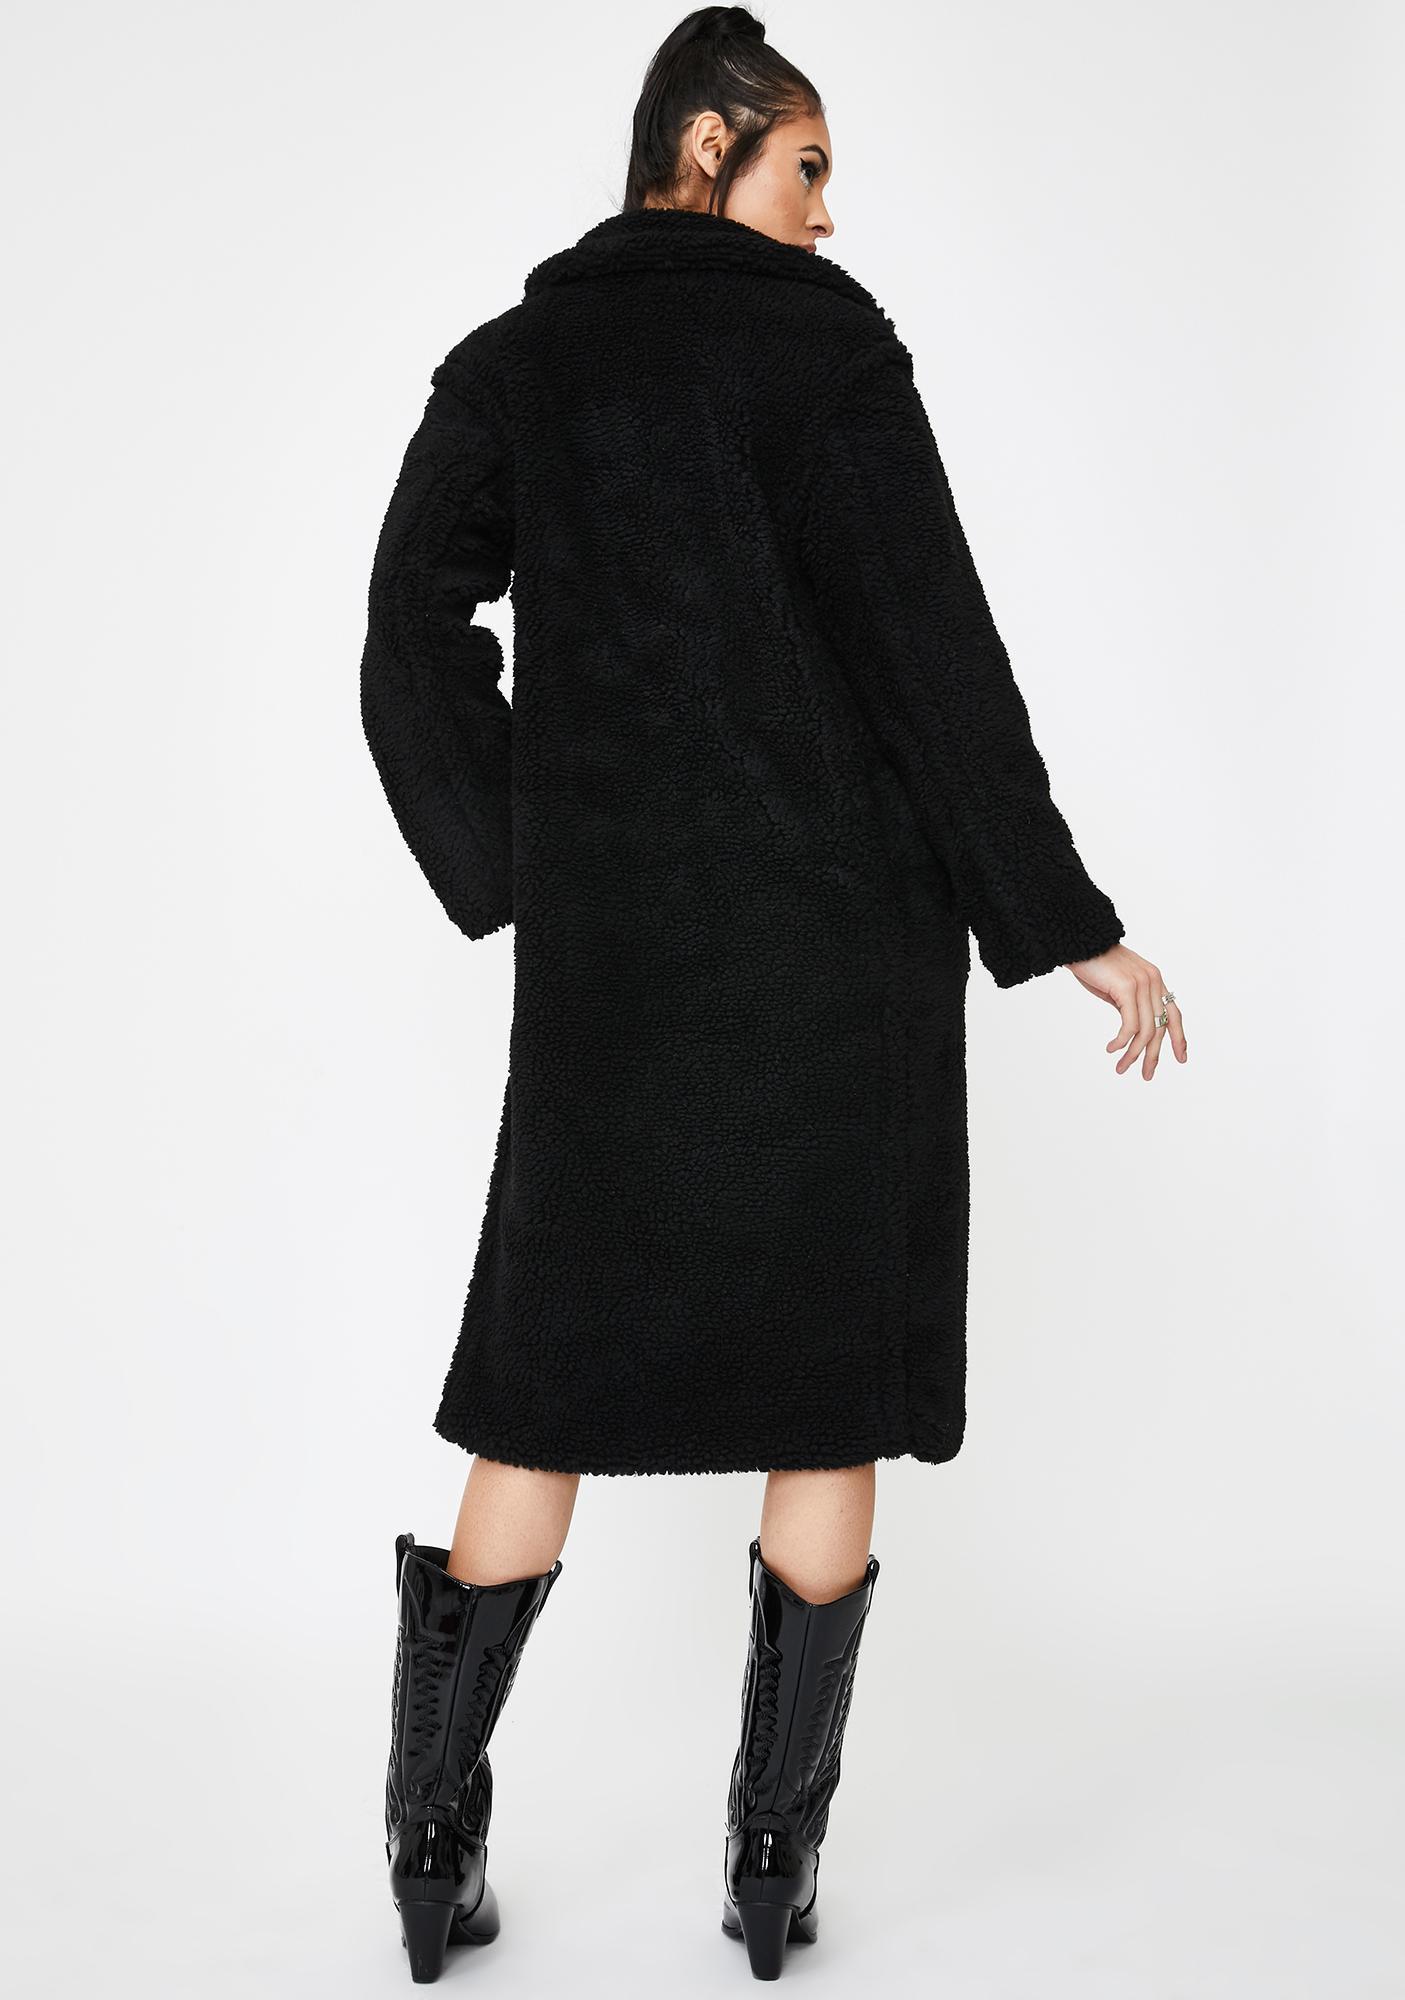 BB Dakota Black Paddington Teddy Coat